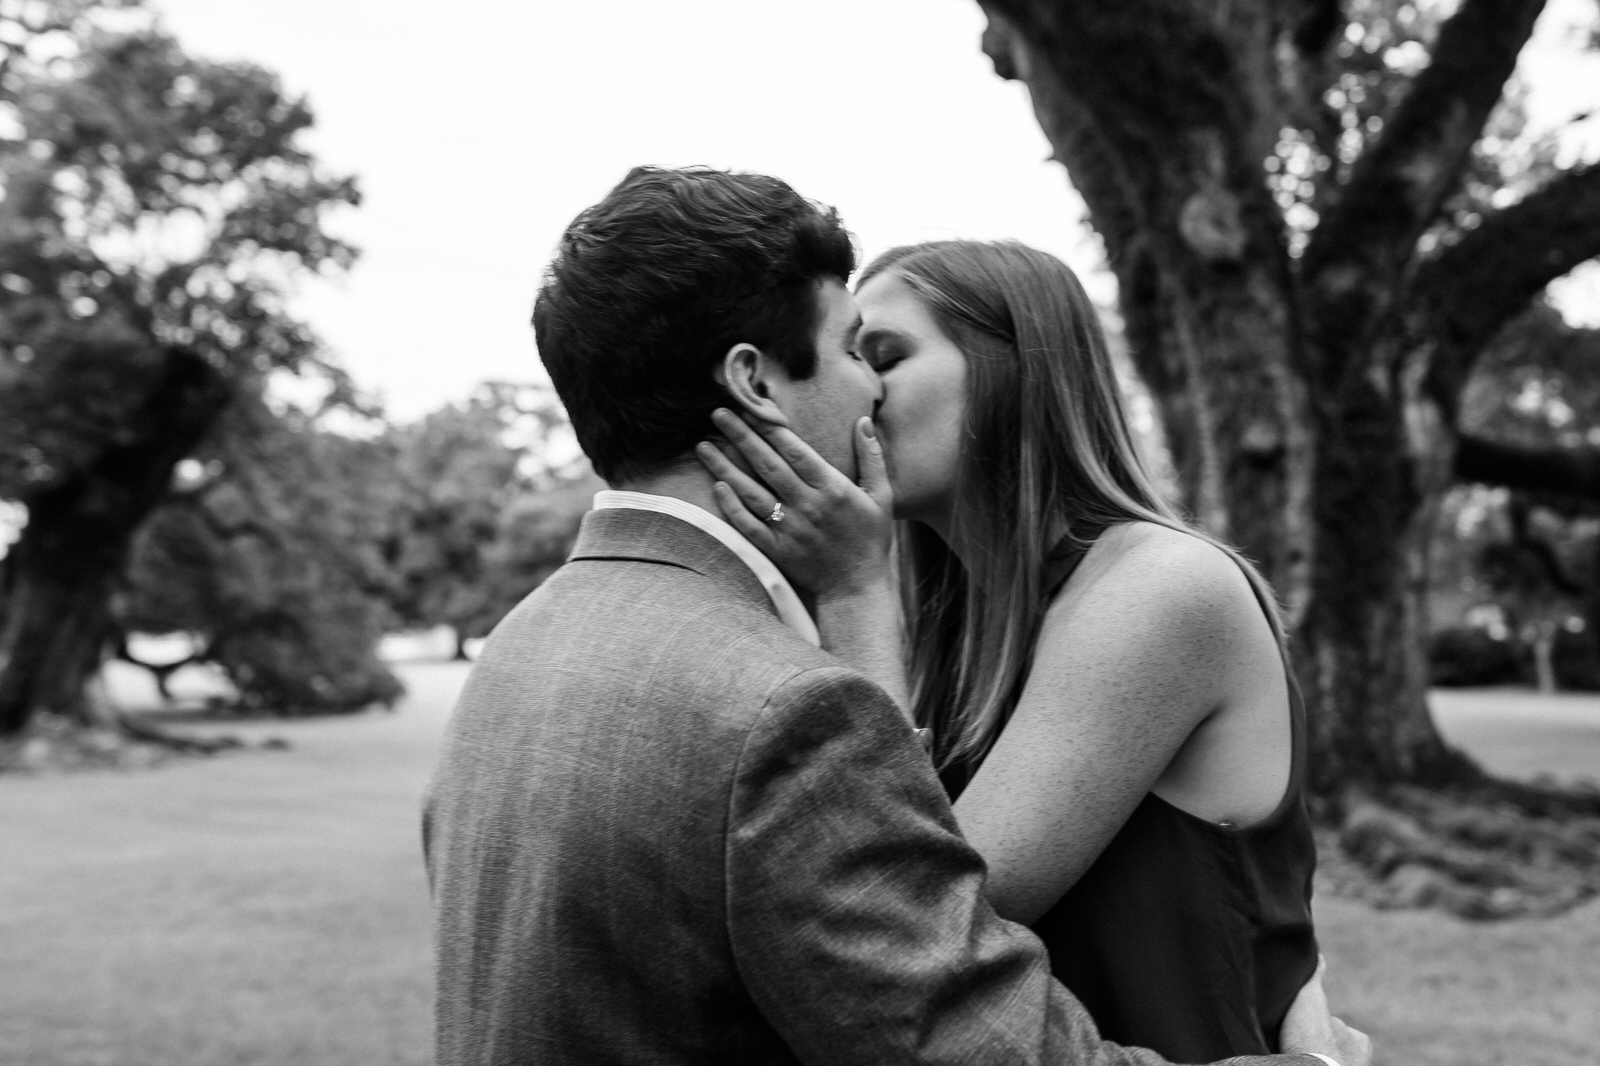 kissing under the oak trees